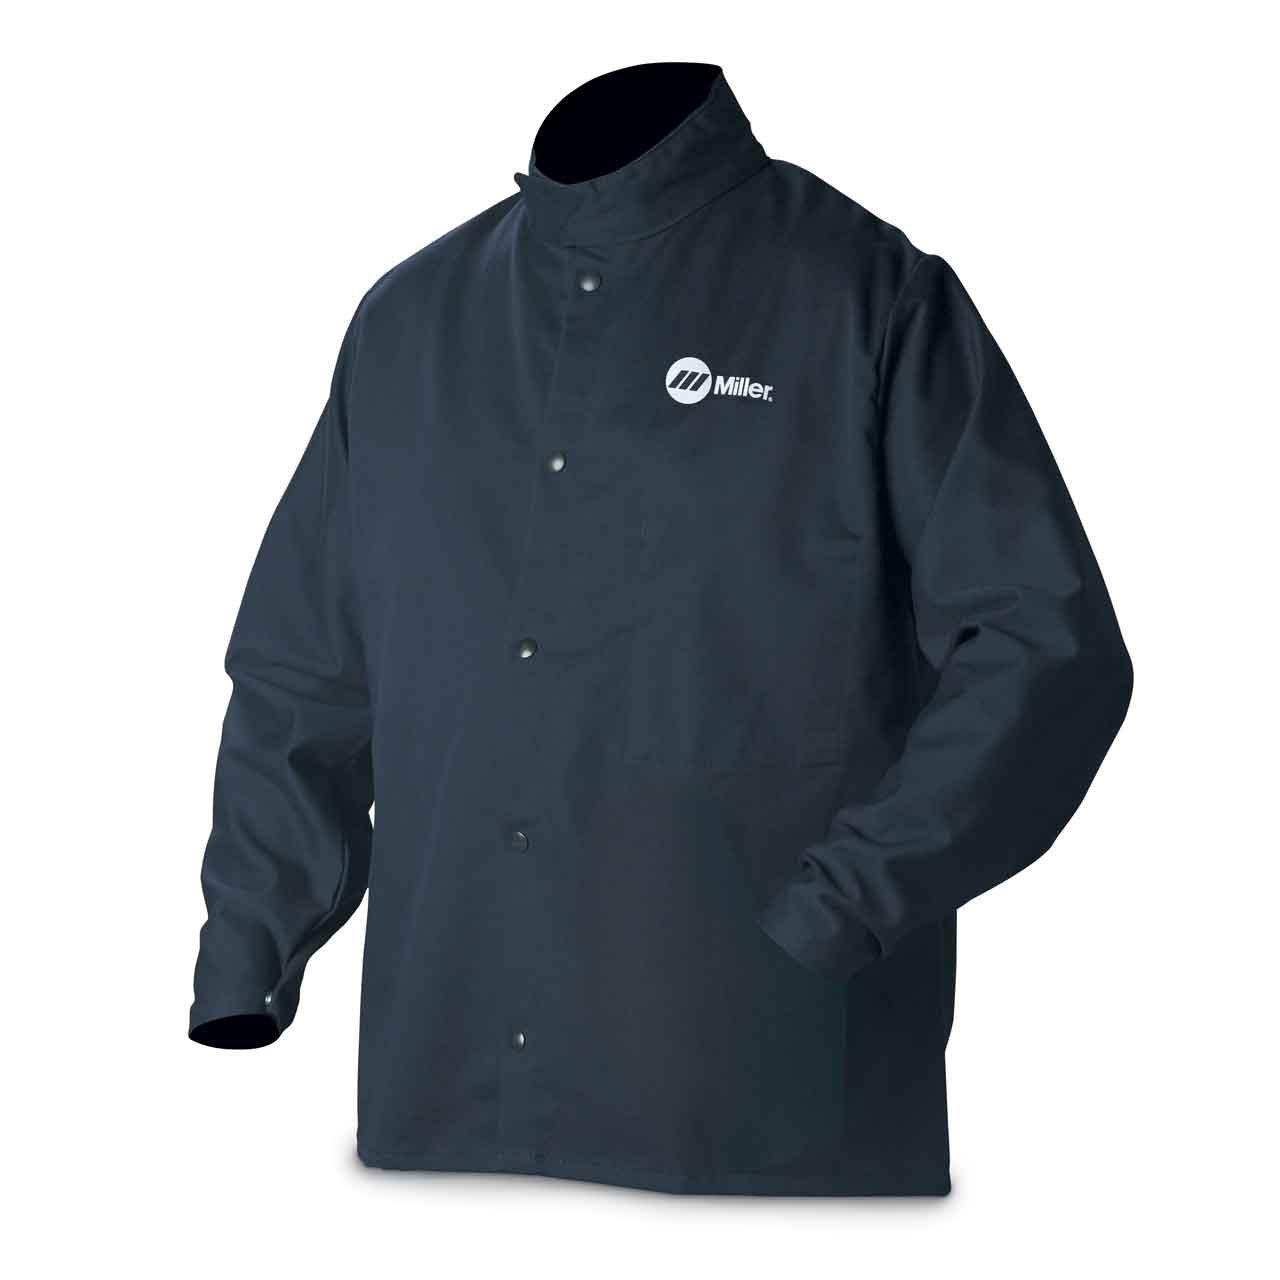 Welding Jacket, Navy, Cotton/Nylon, M Miller Electric 2207775